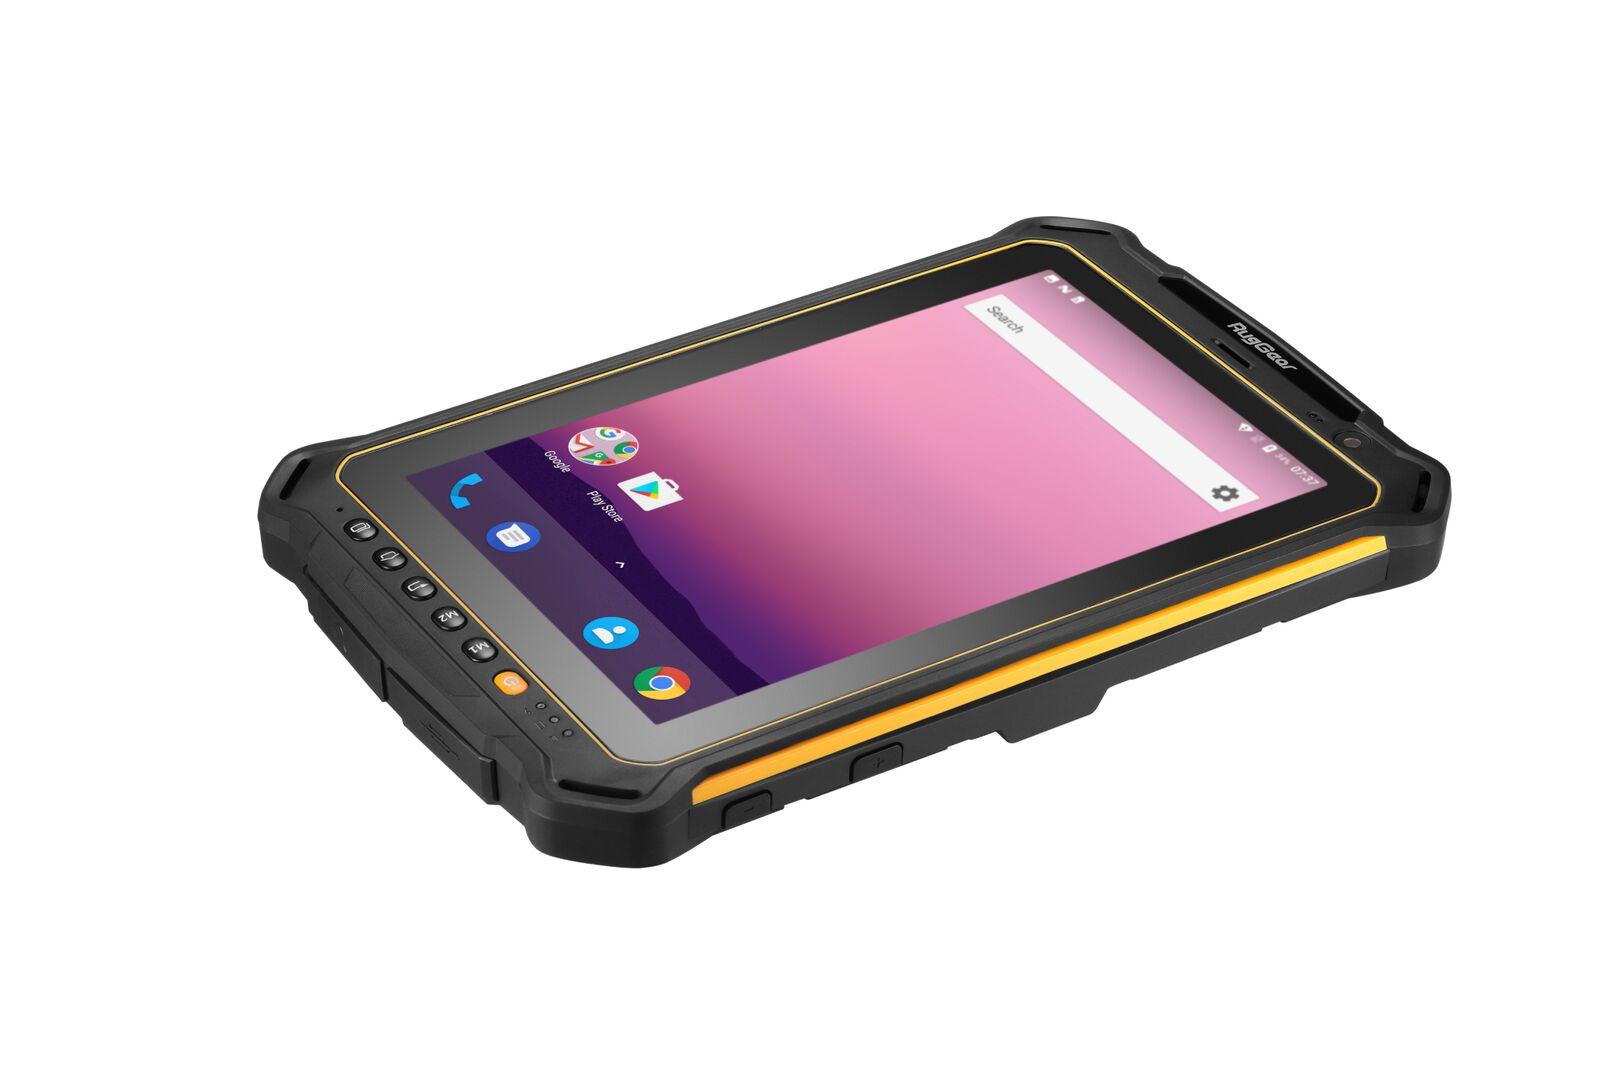 8d760cad0 RugGear  Rugged-Tablet mit Android vorgestellt - Notebookcheck.com News